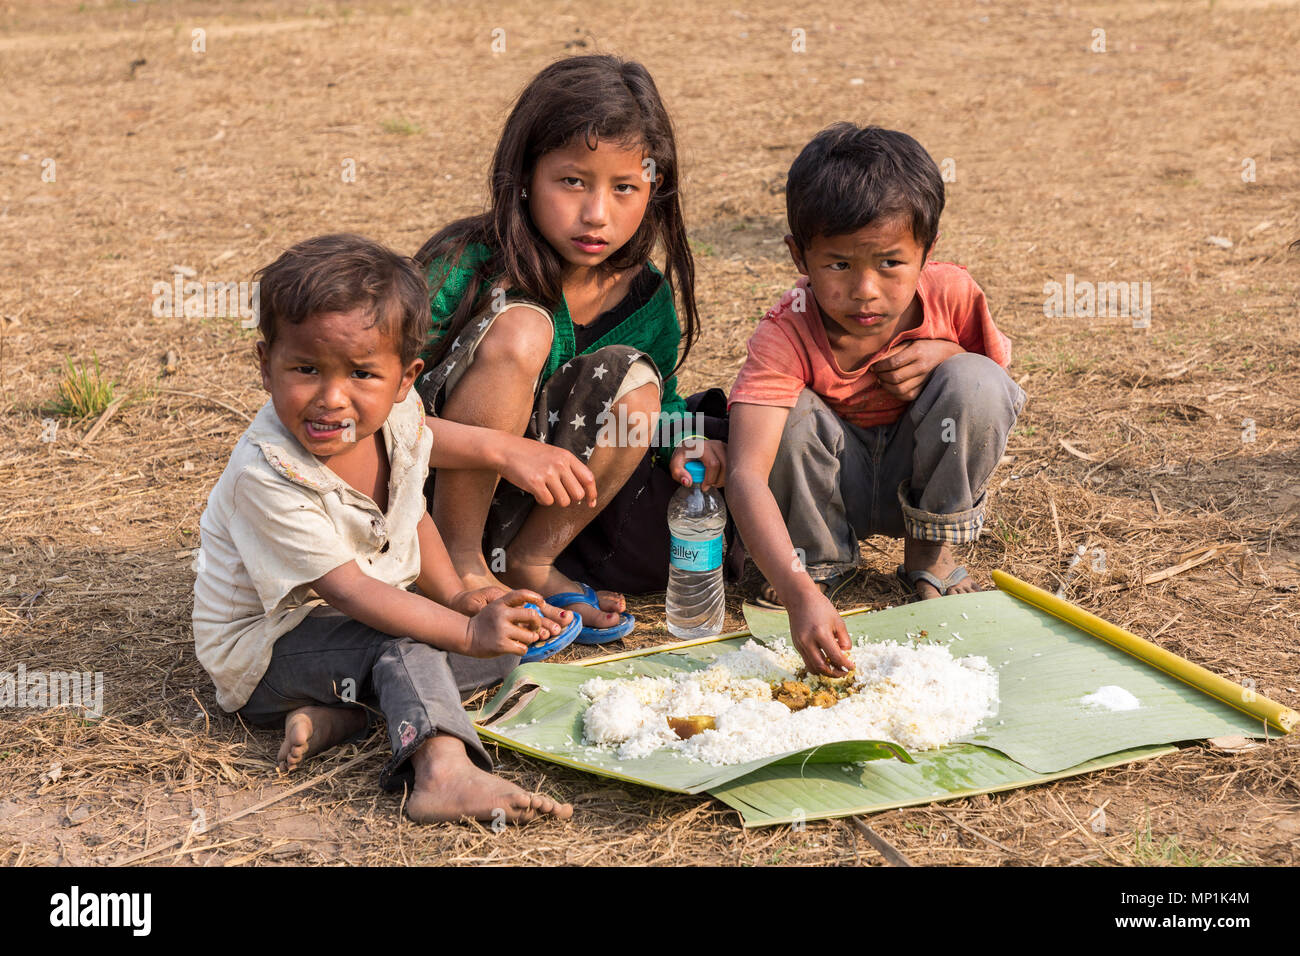 Children eating communal meal on the ground, Sakwa, Meghalaya, India - Stock Image